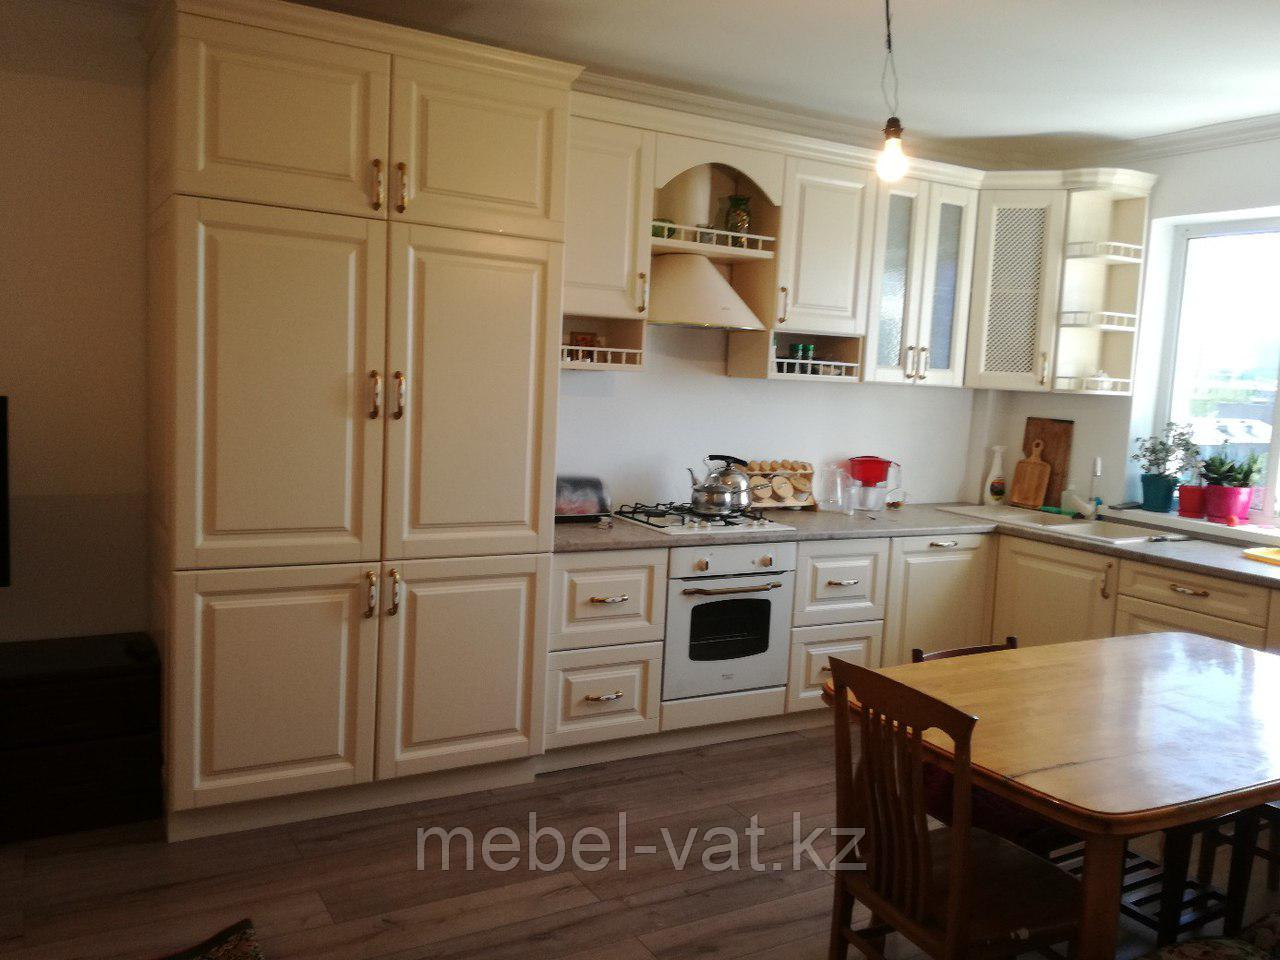 Кухня кантри. Алматы